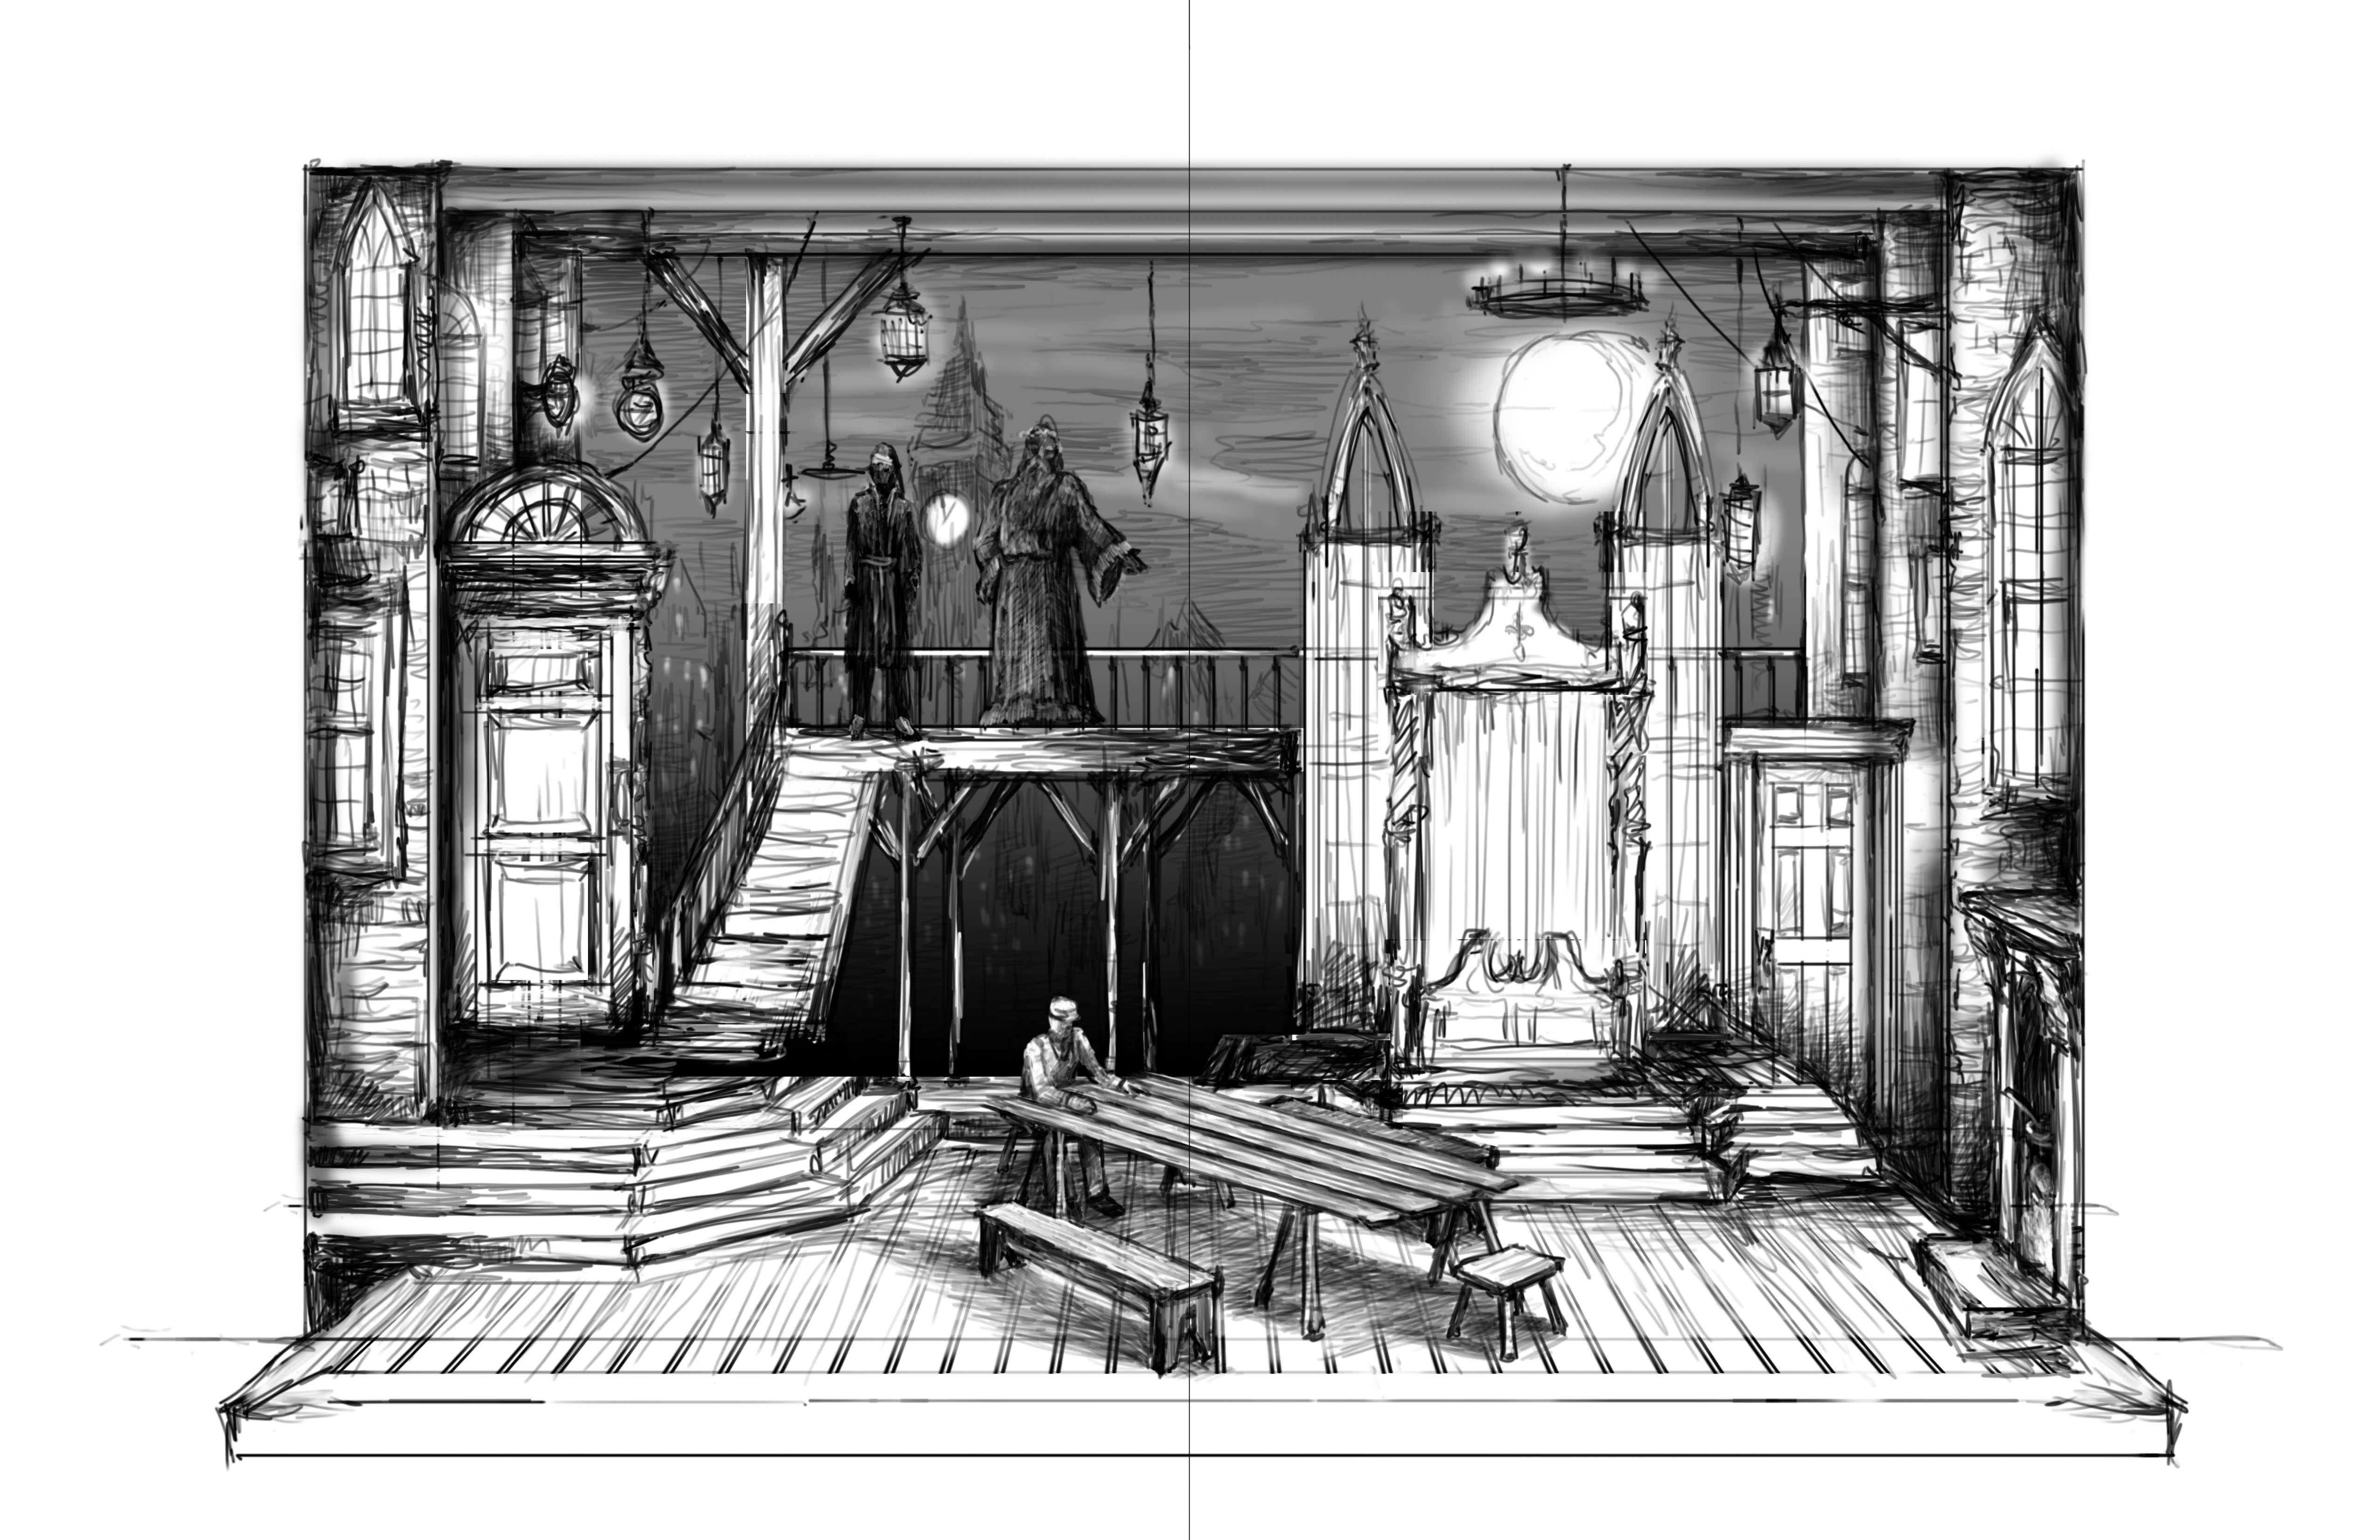 14. Cratchit's House